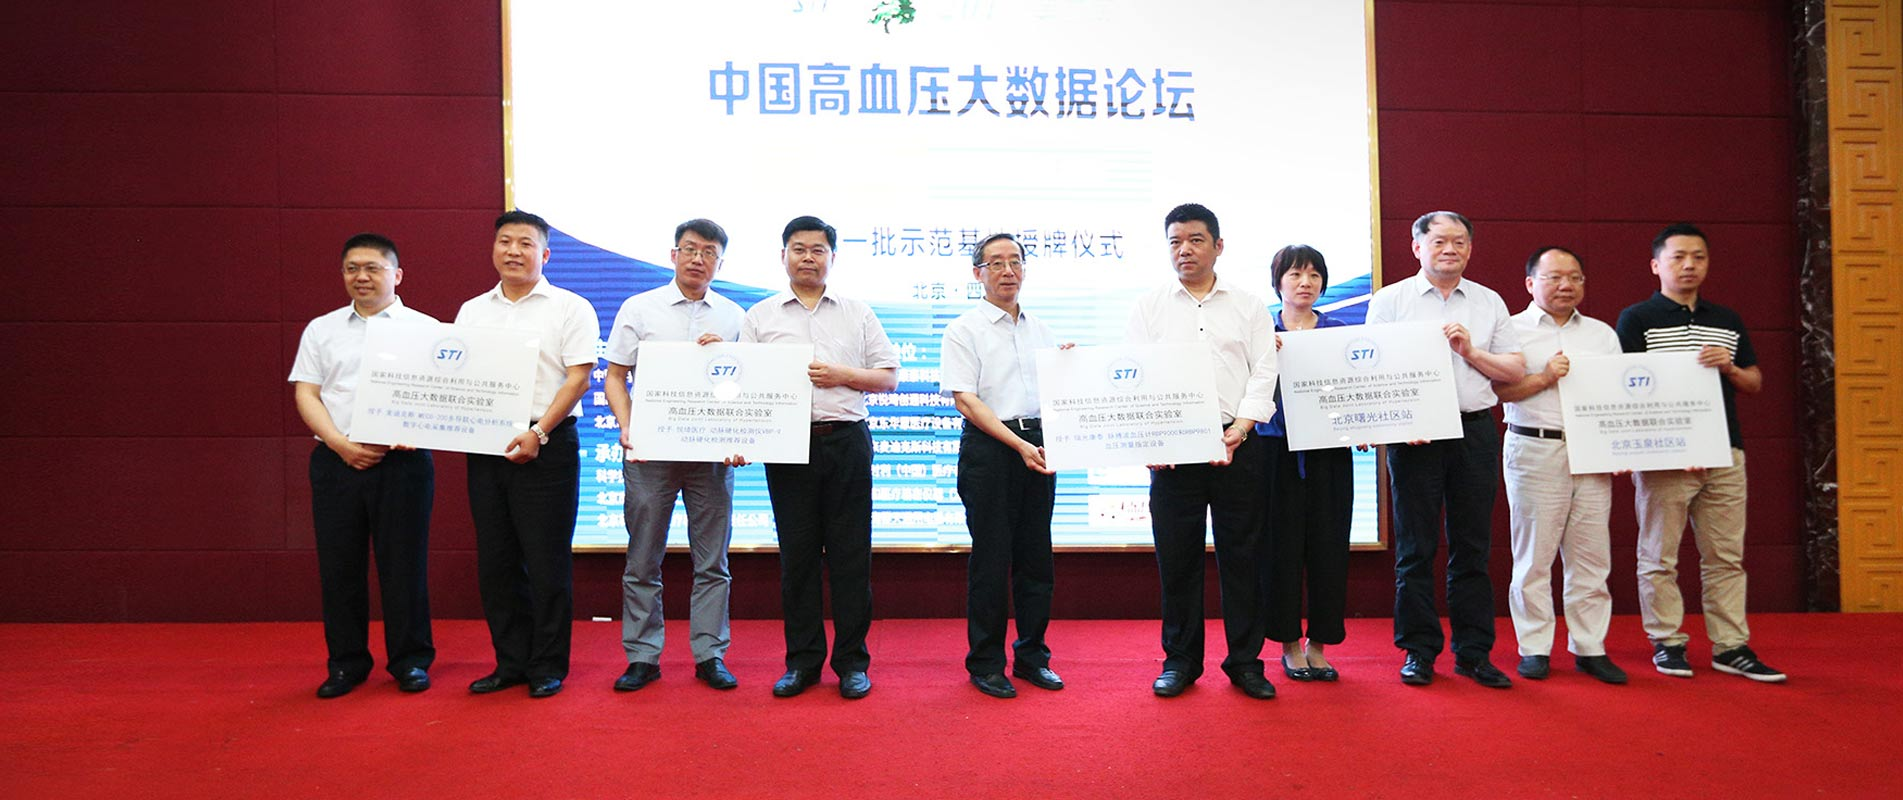 Raycome in China High Blood Pressure Big Data Forum